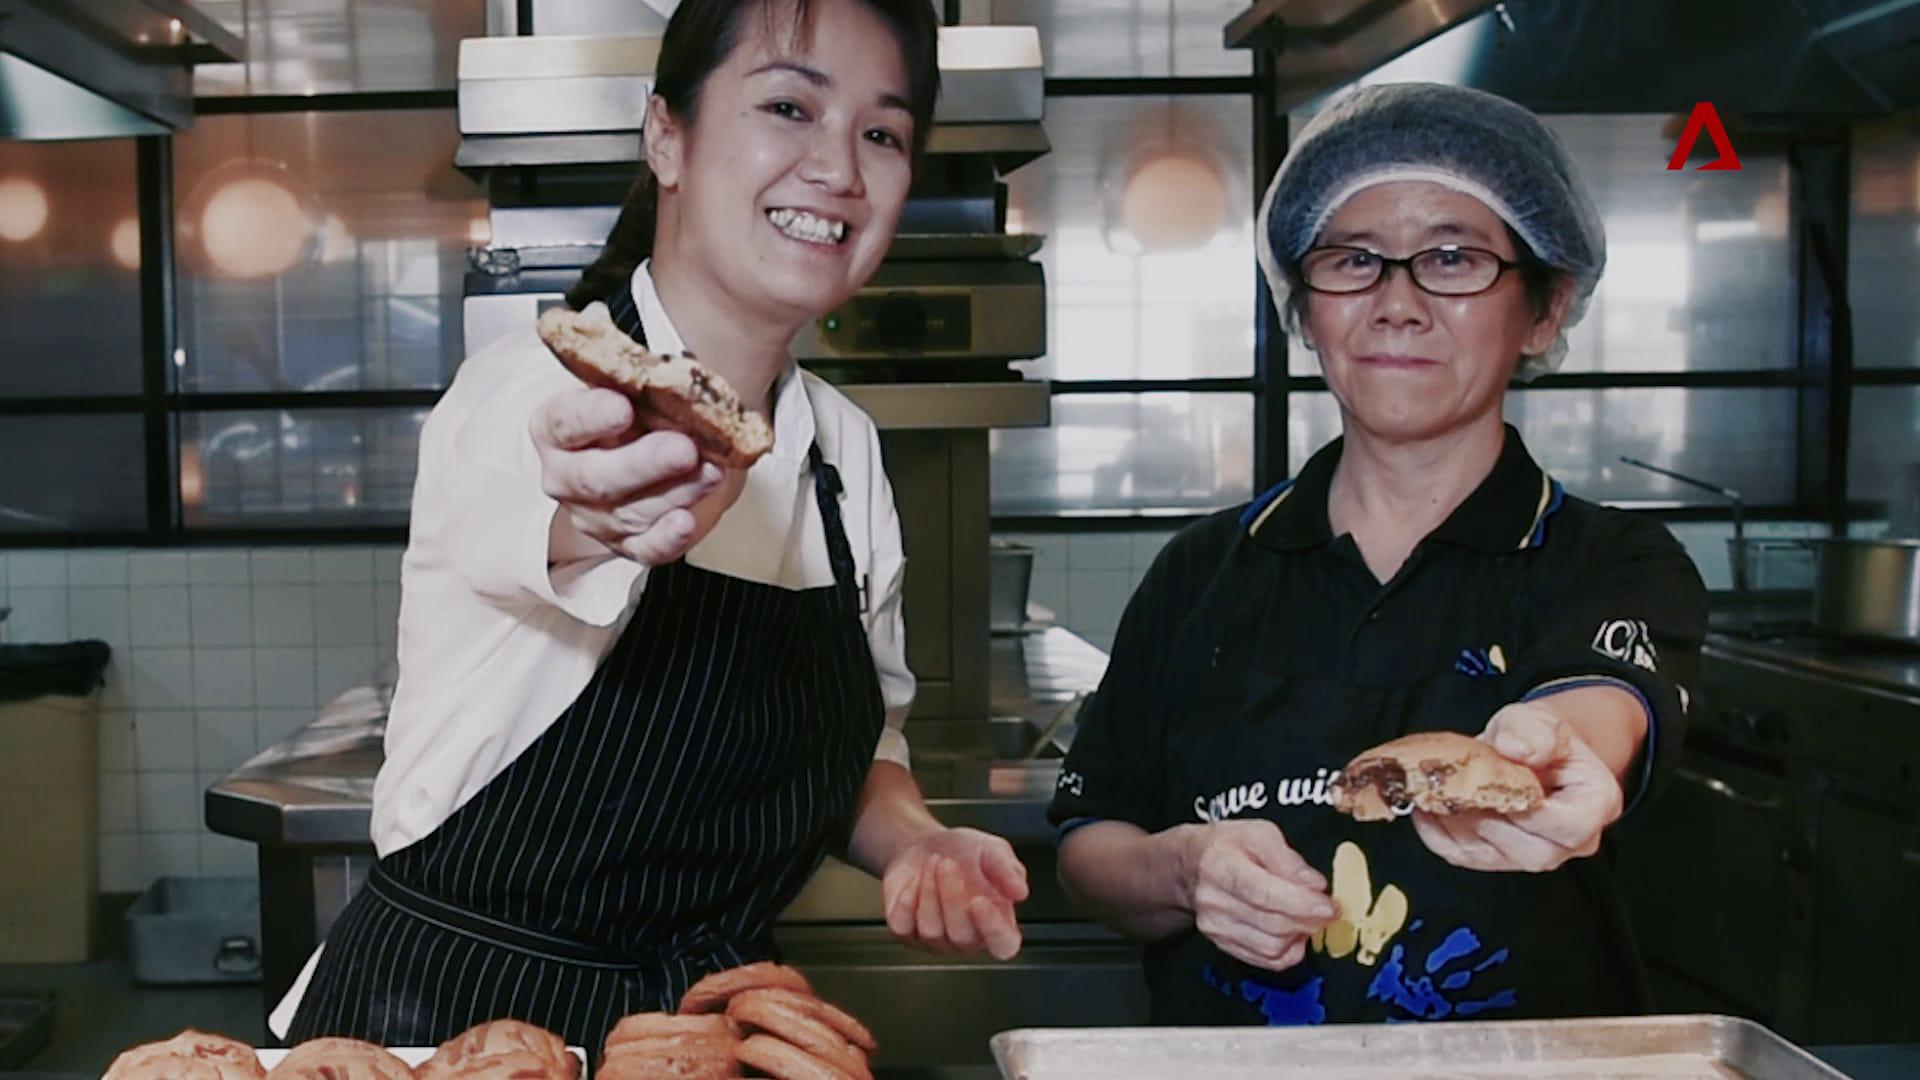 Disabled chef hones skills at Marina Bay Sands restaurant | Video